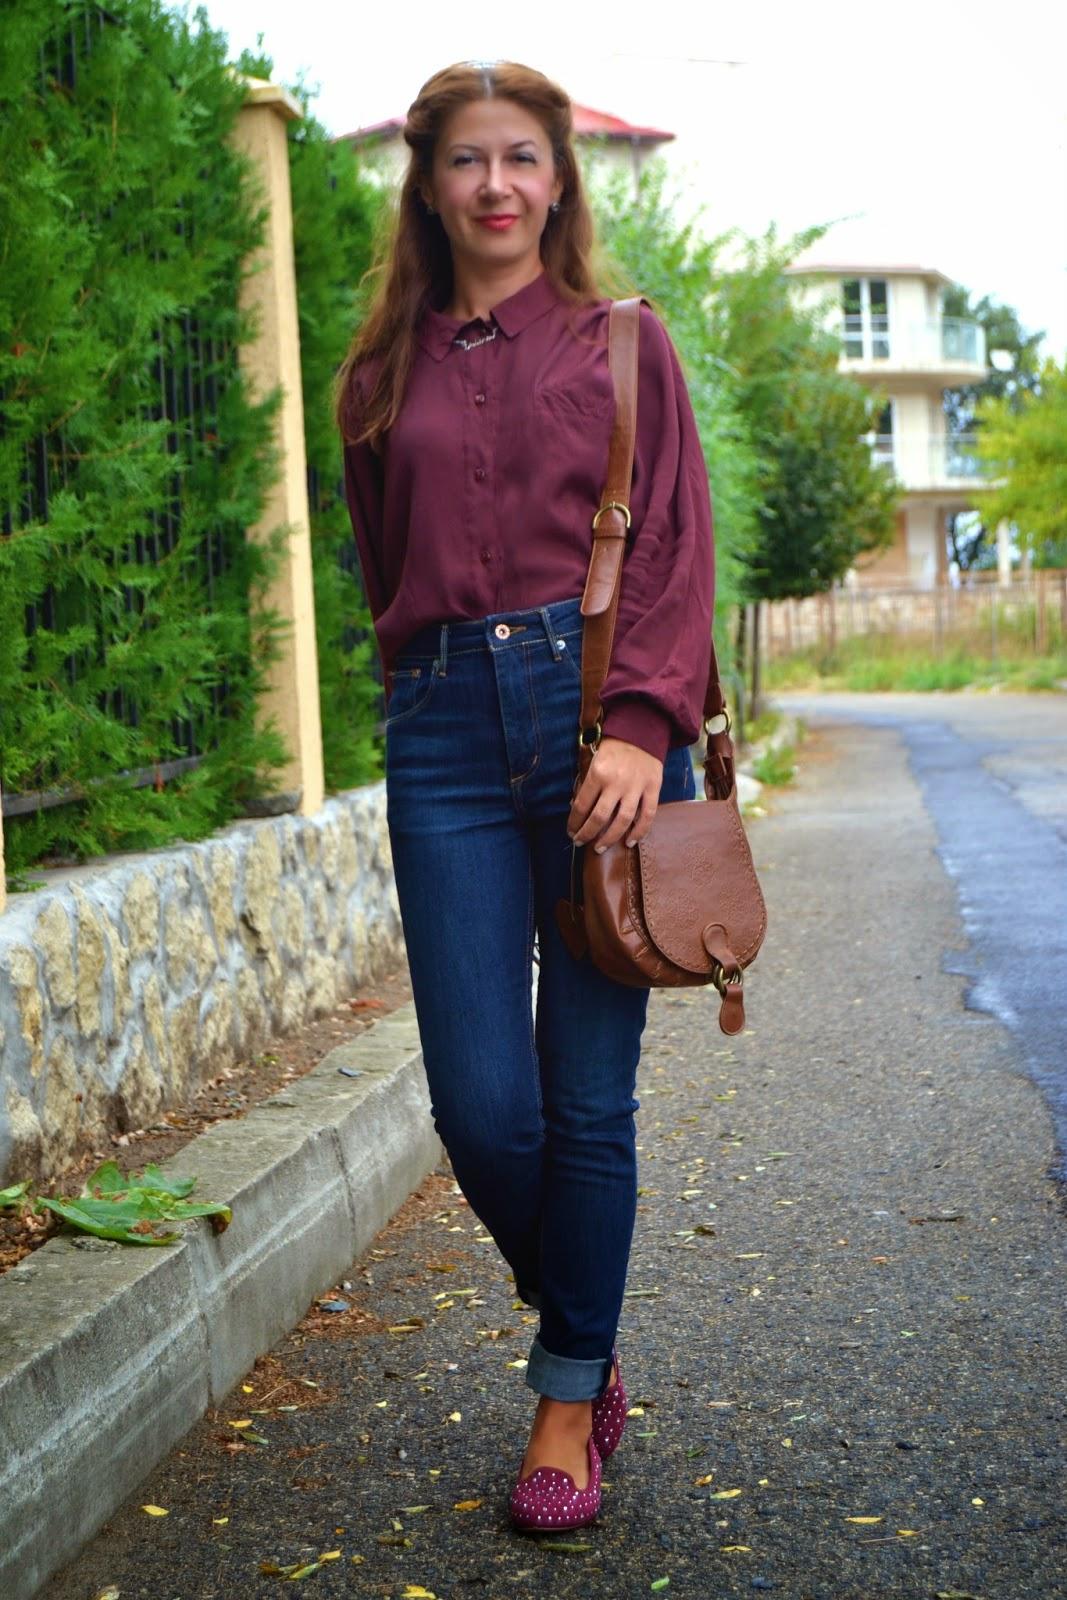 burgundy shirt look